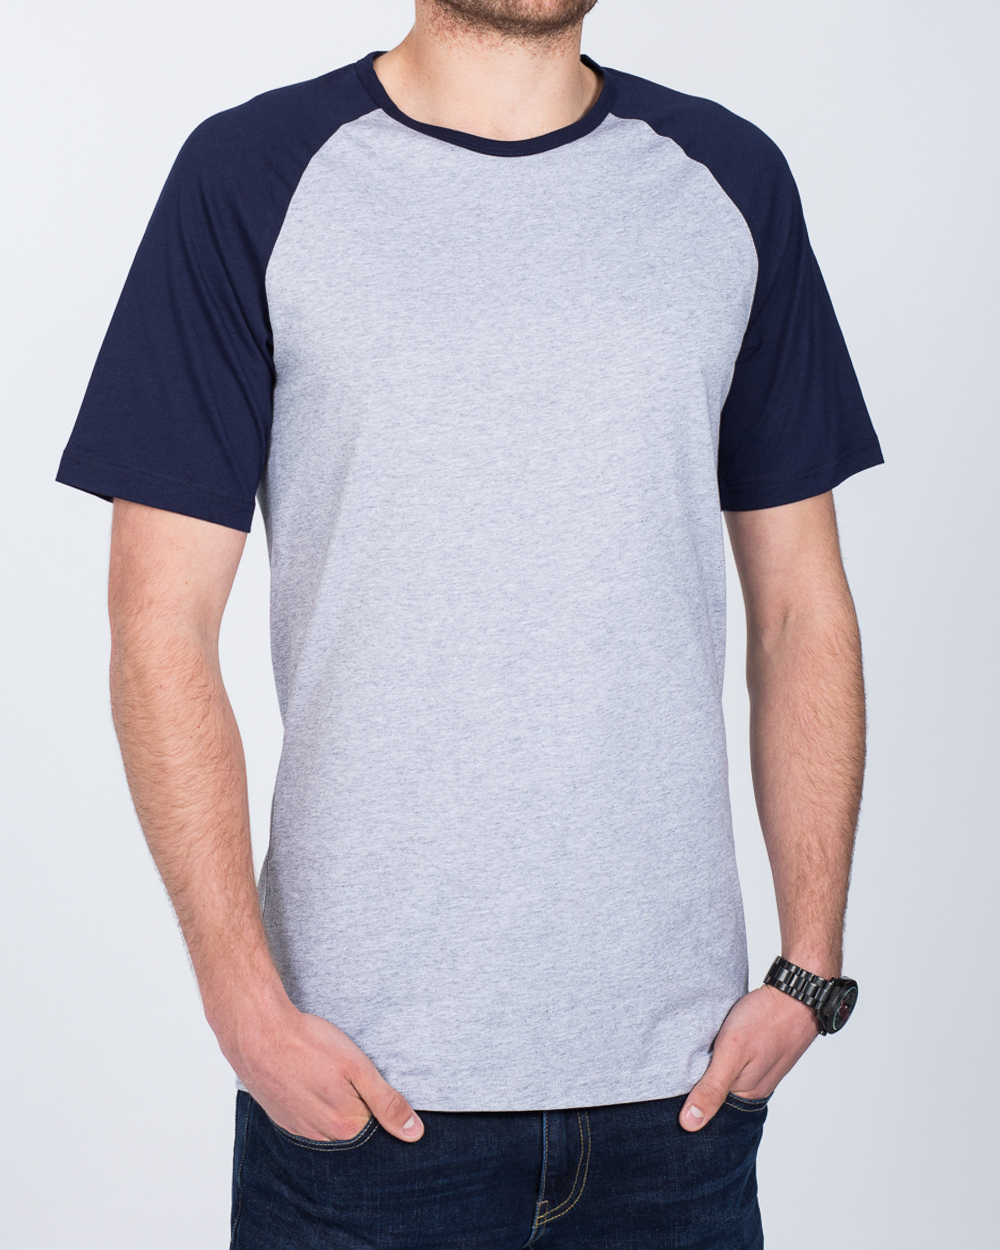 2t Raglan Tall T-Shirt (grey/navy)